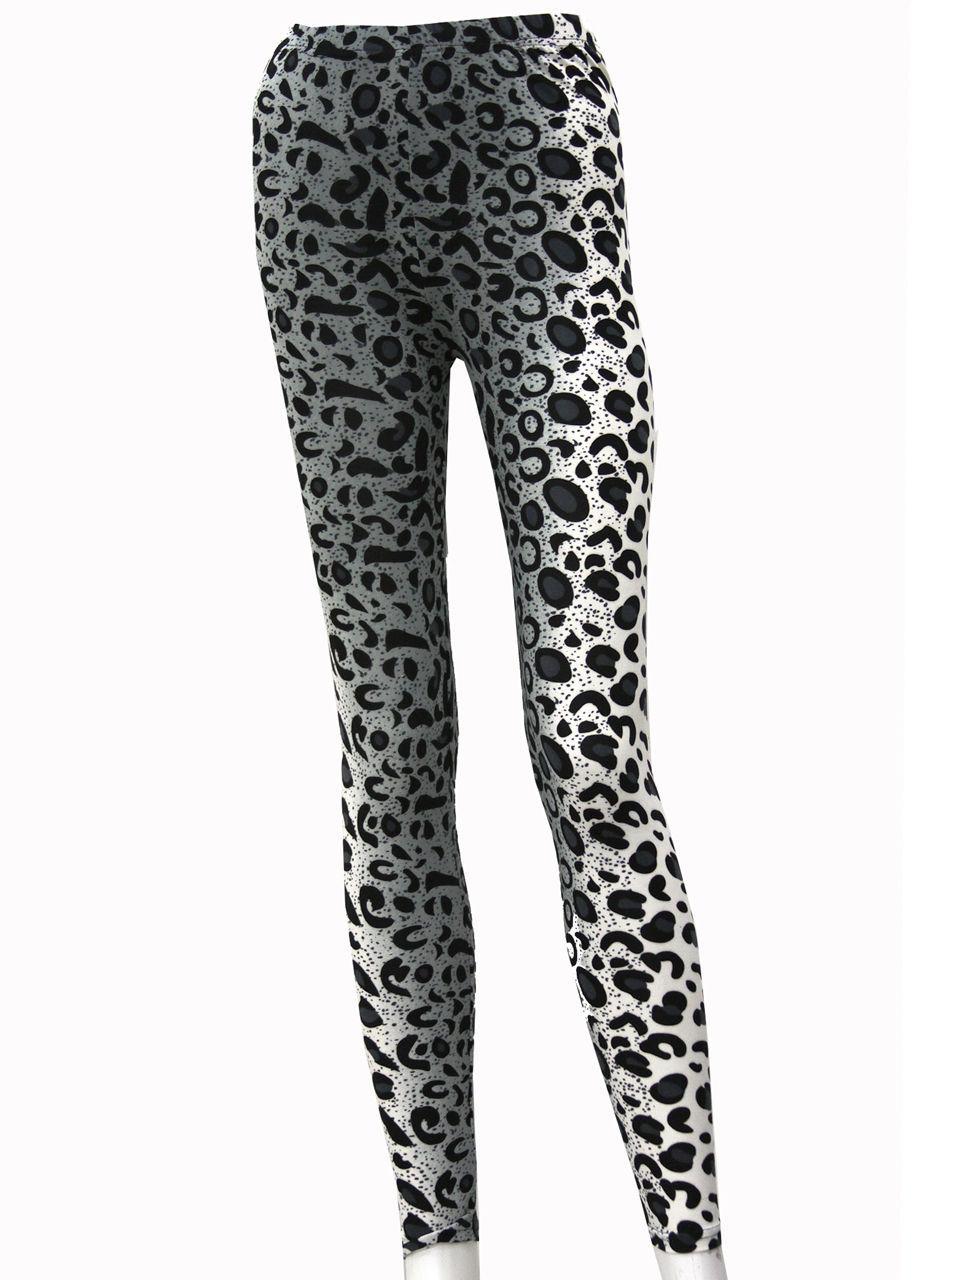 1f3799638 kgrhqv i8fbh7zq kbqlf7q 12g 60 57. kgrhqv i8fbh7zq kbqlf7q 12g 60 57.  Fashion Mic Womens Animal Leopard Print Casual Everyday Leggings